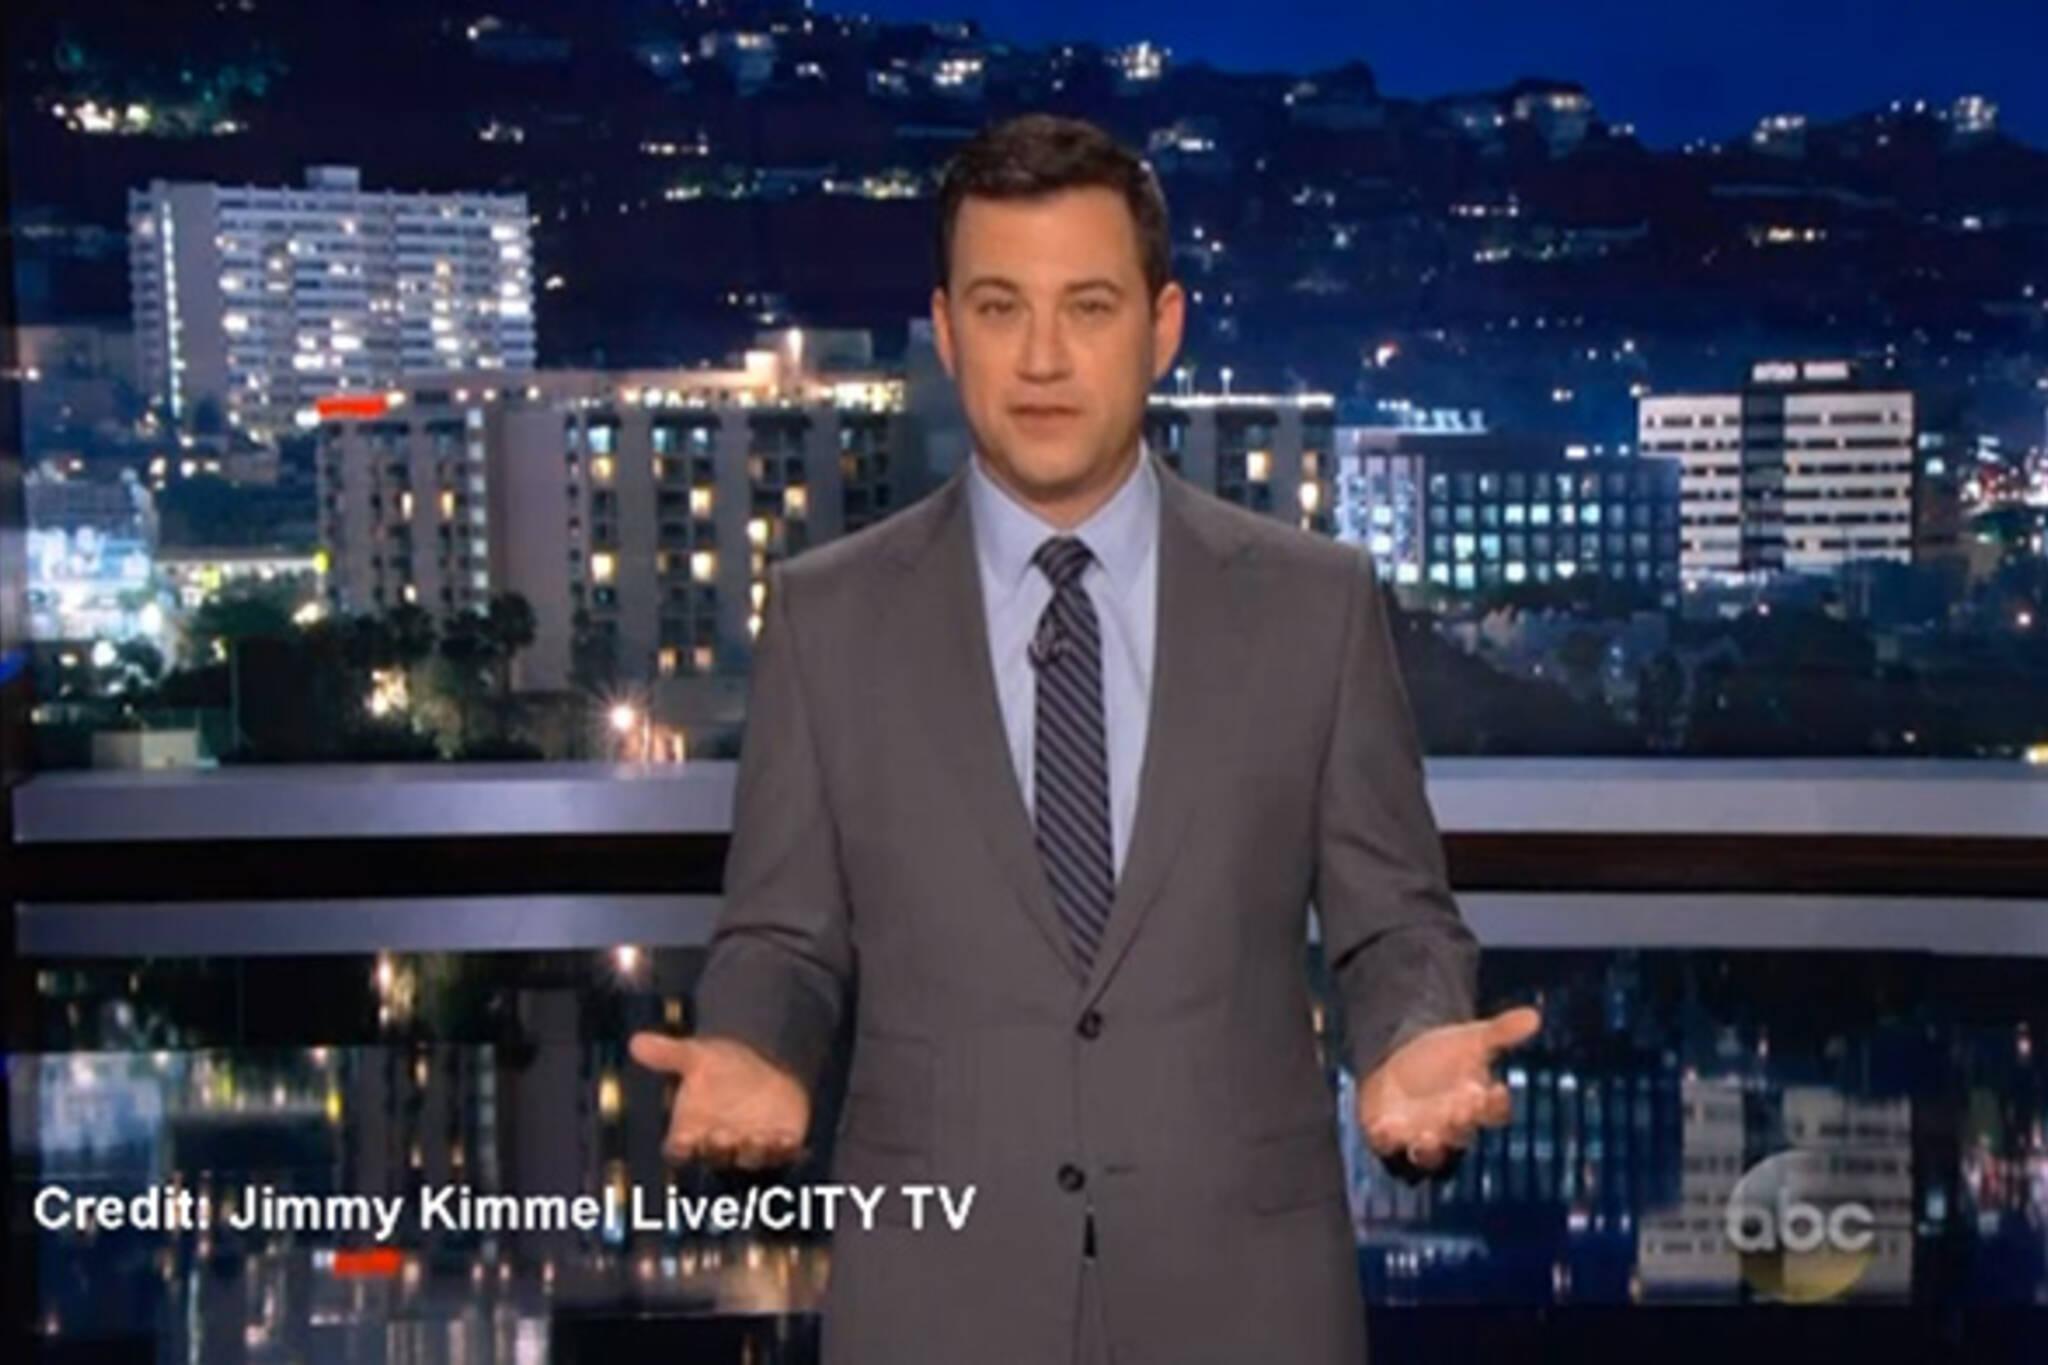 Jimmy Kimmel Rob Ford